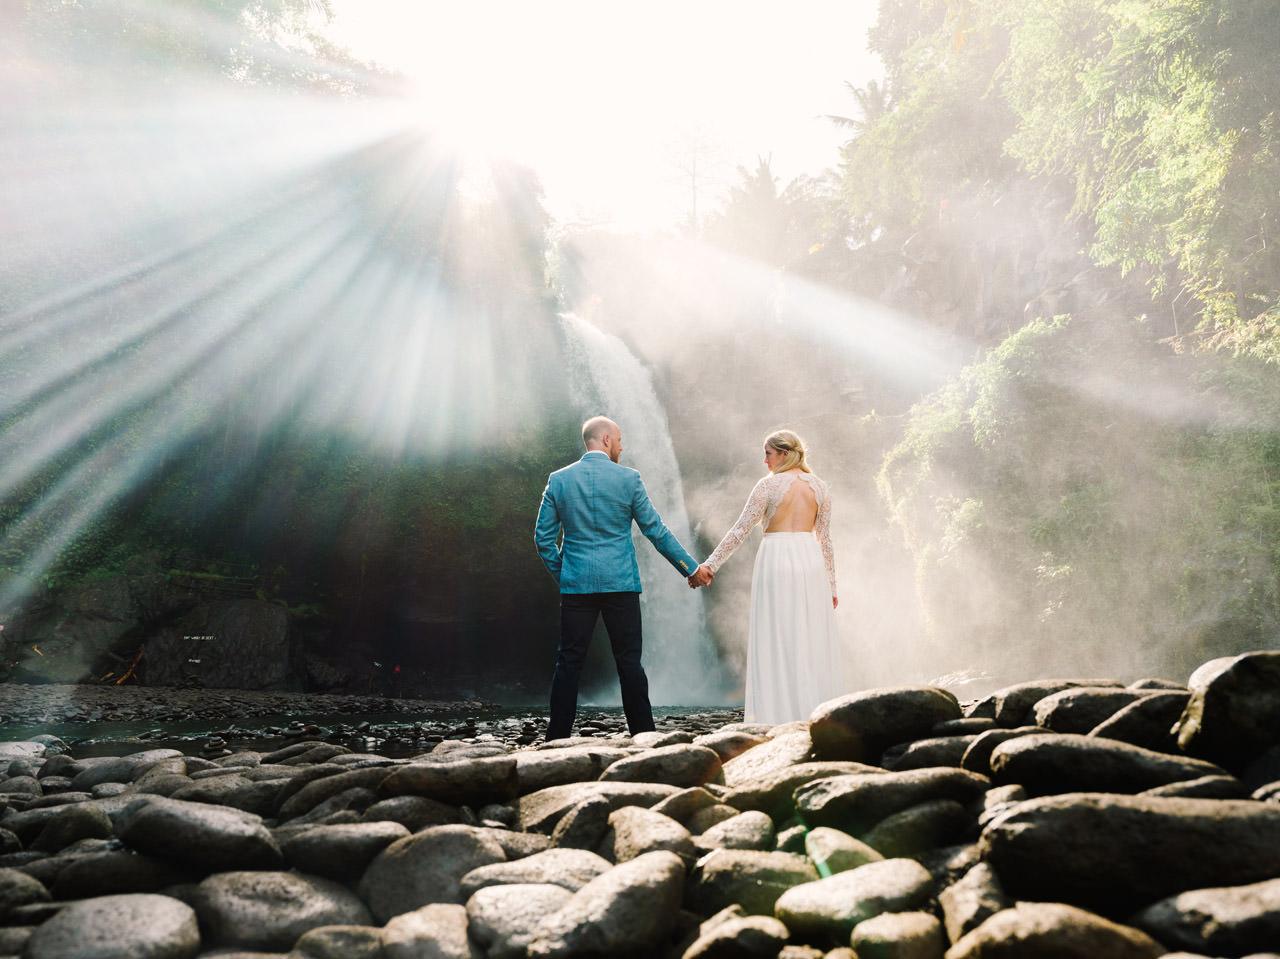 Amy & Rory: Honeymoon Photography at Campuhan Ridge Walk 23